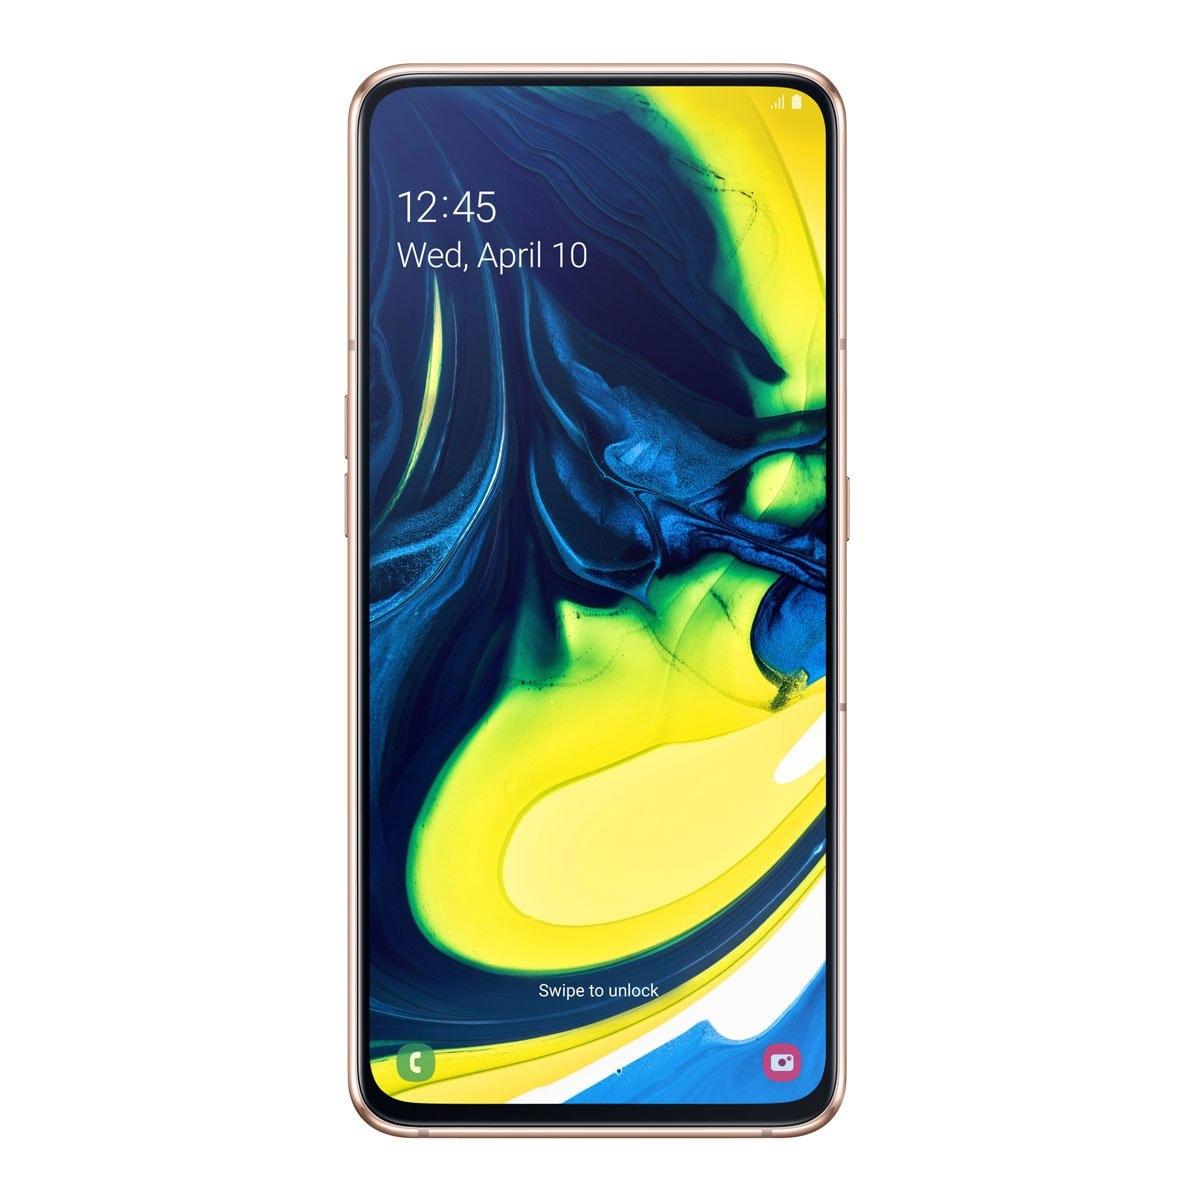 Celular Samsung Galaxy A80 Color Dorado R9 (Telcel)